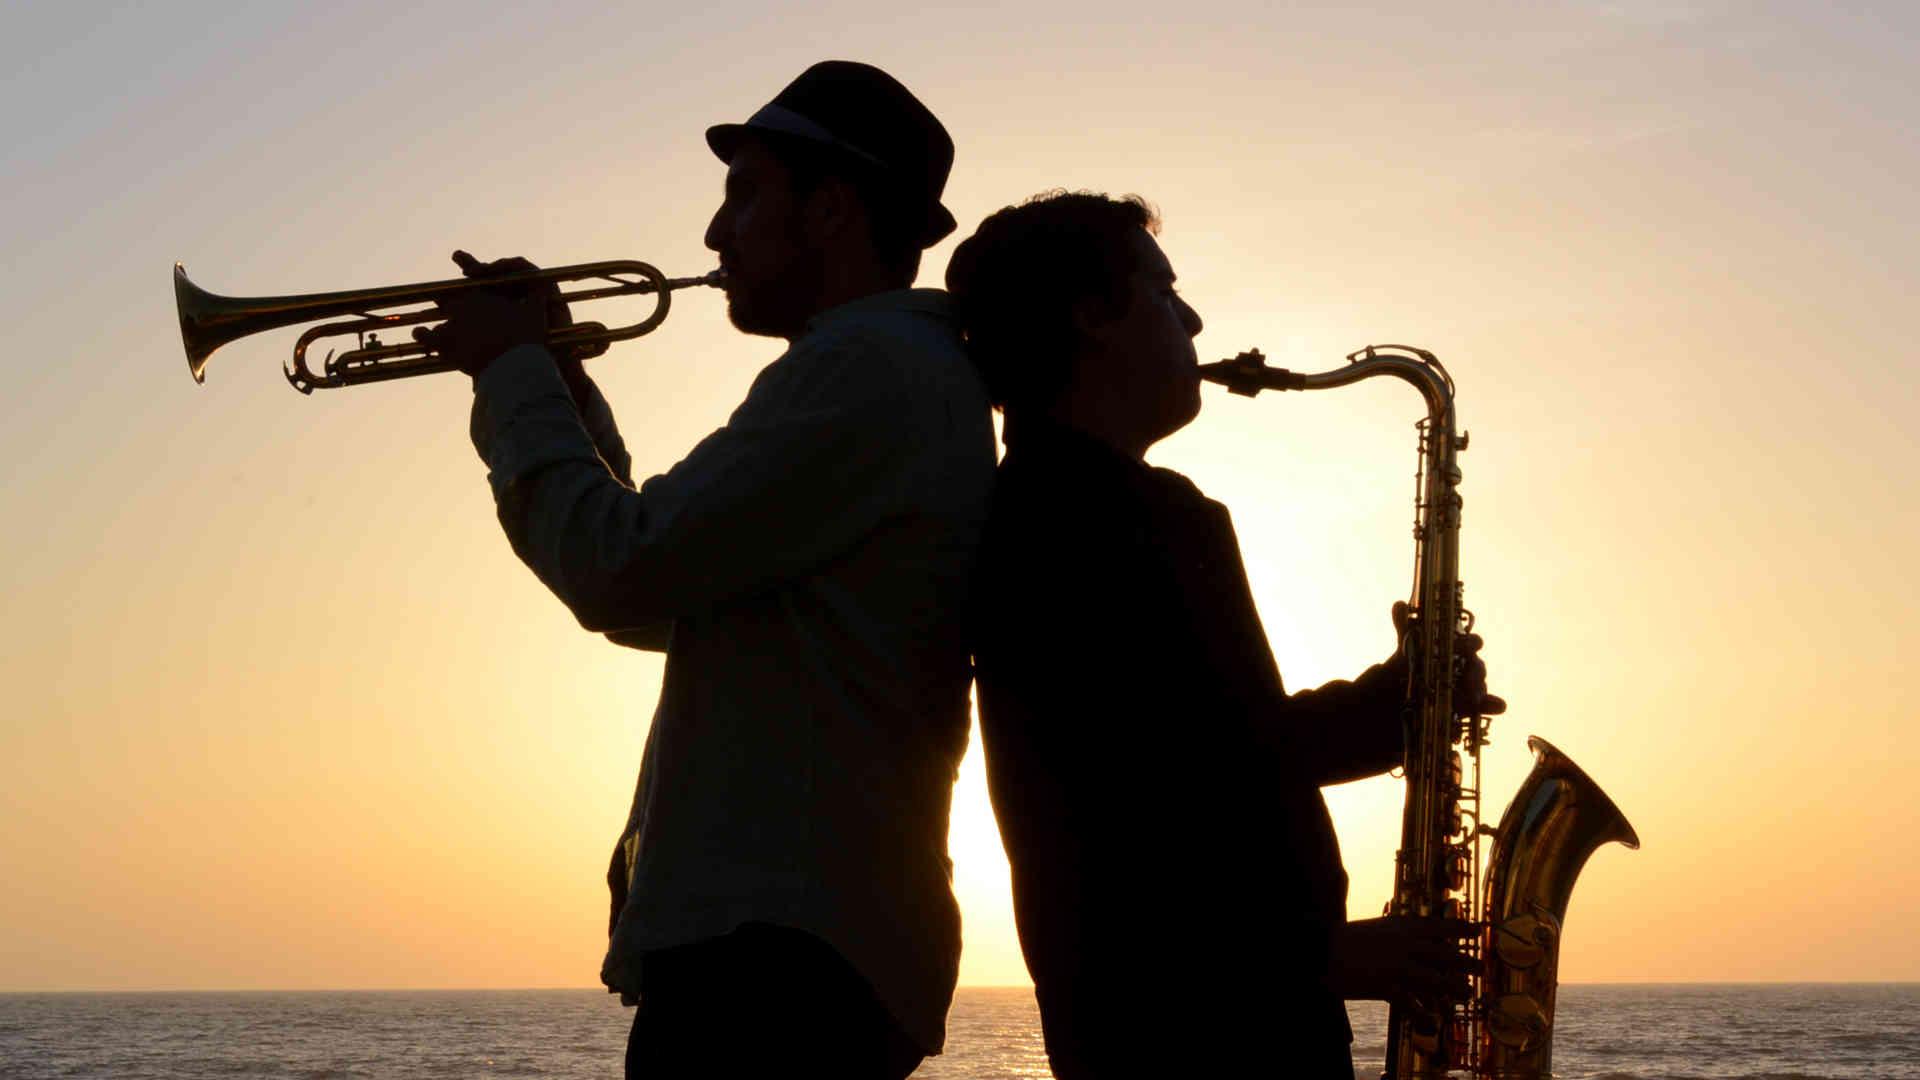 Grupo musical en la playa, silueta - fotografía profesional